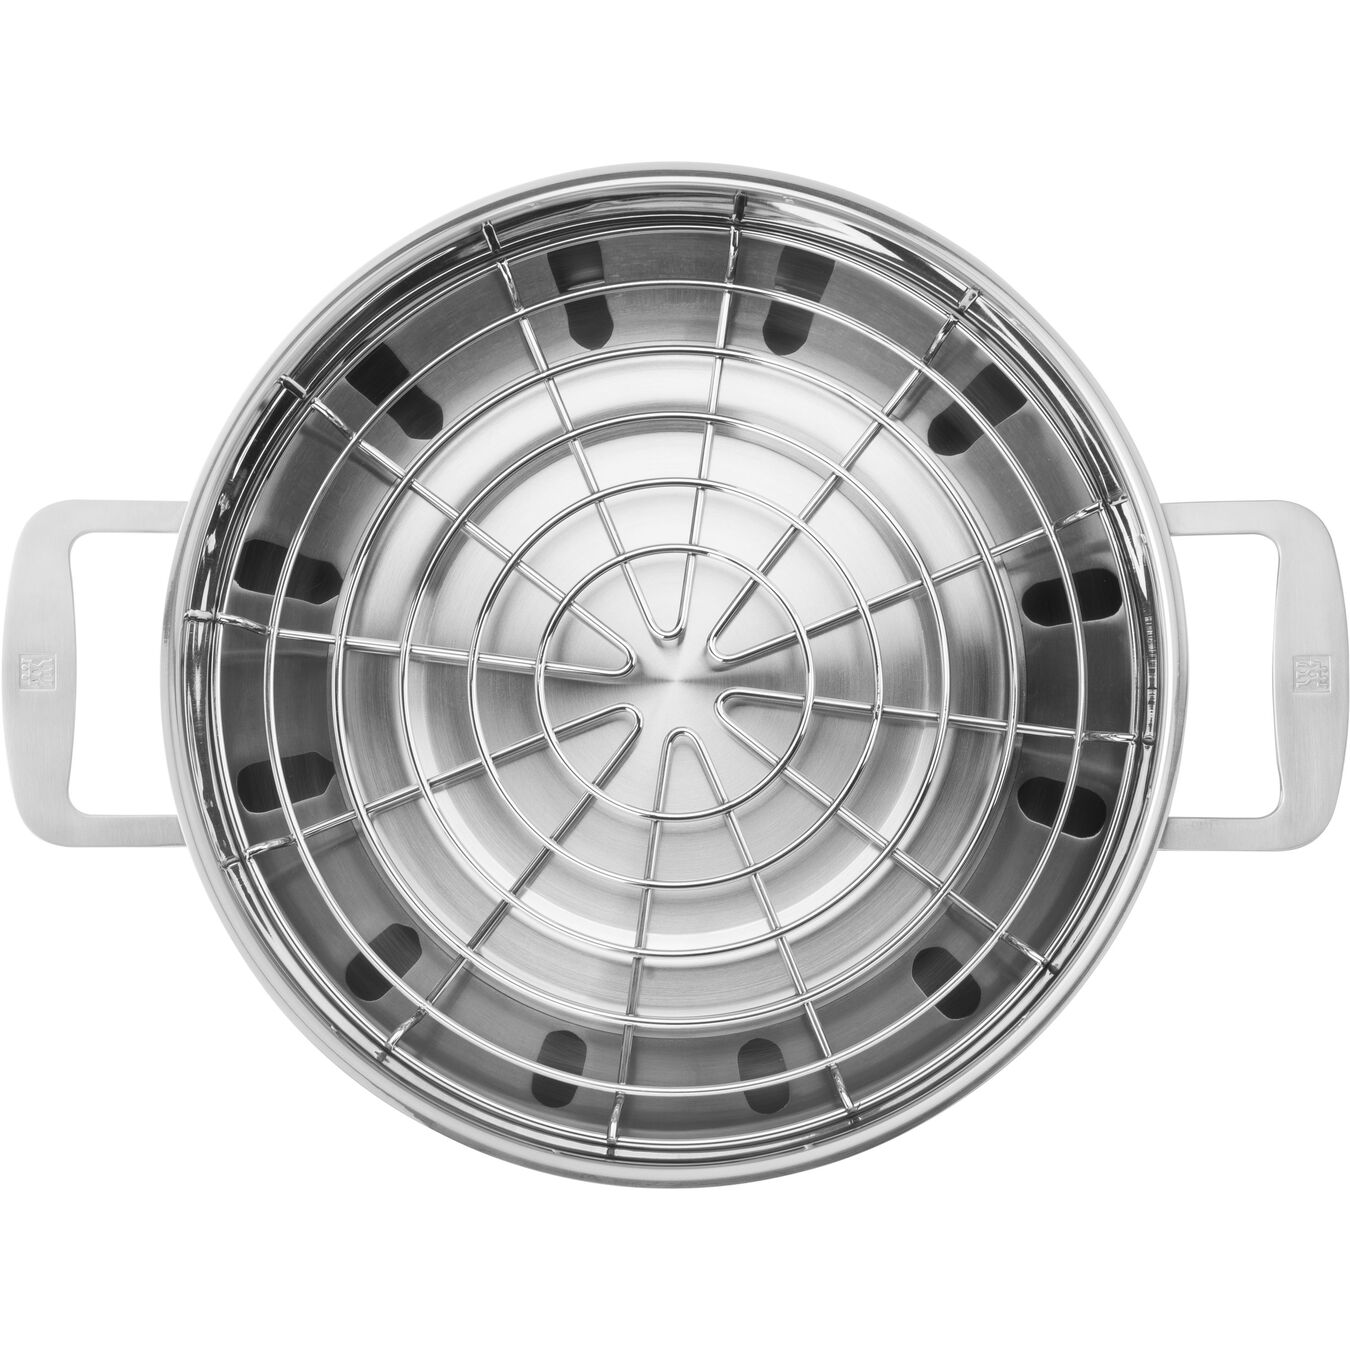 Tütsüleme Seti | yuvarlak,,large 9